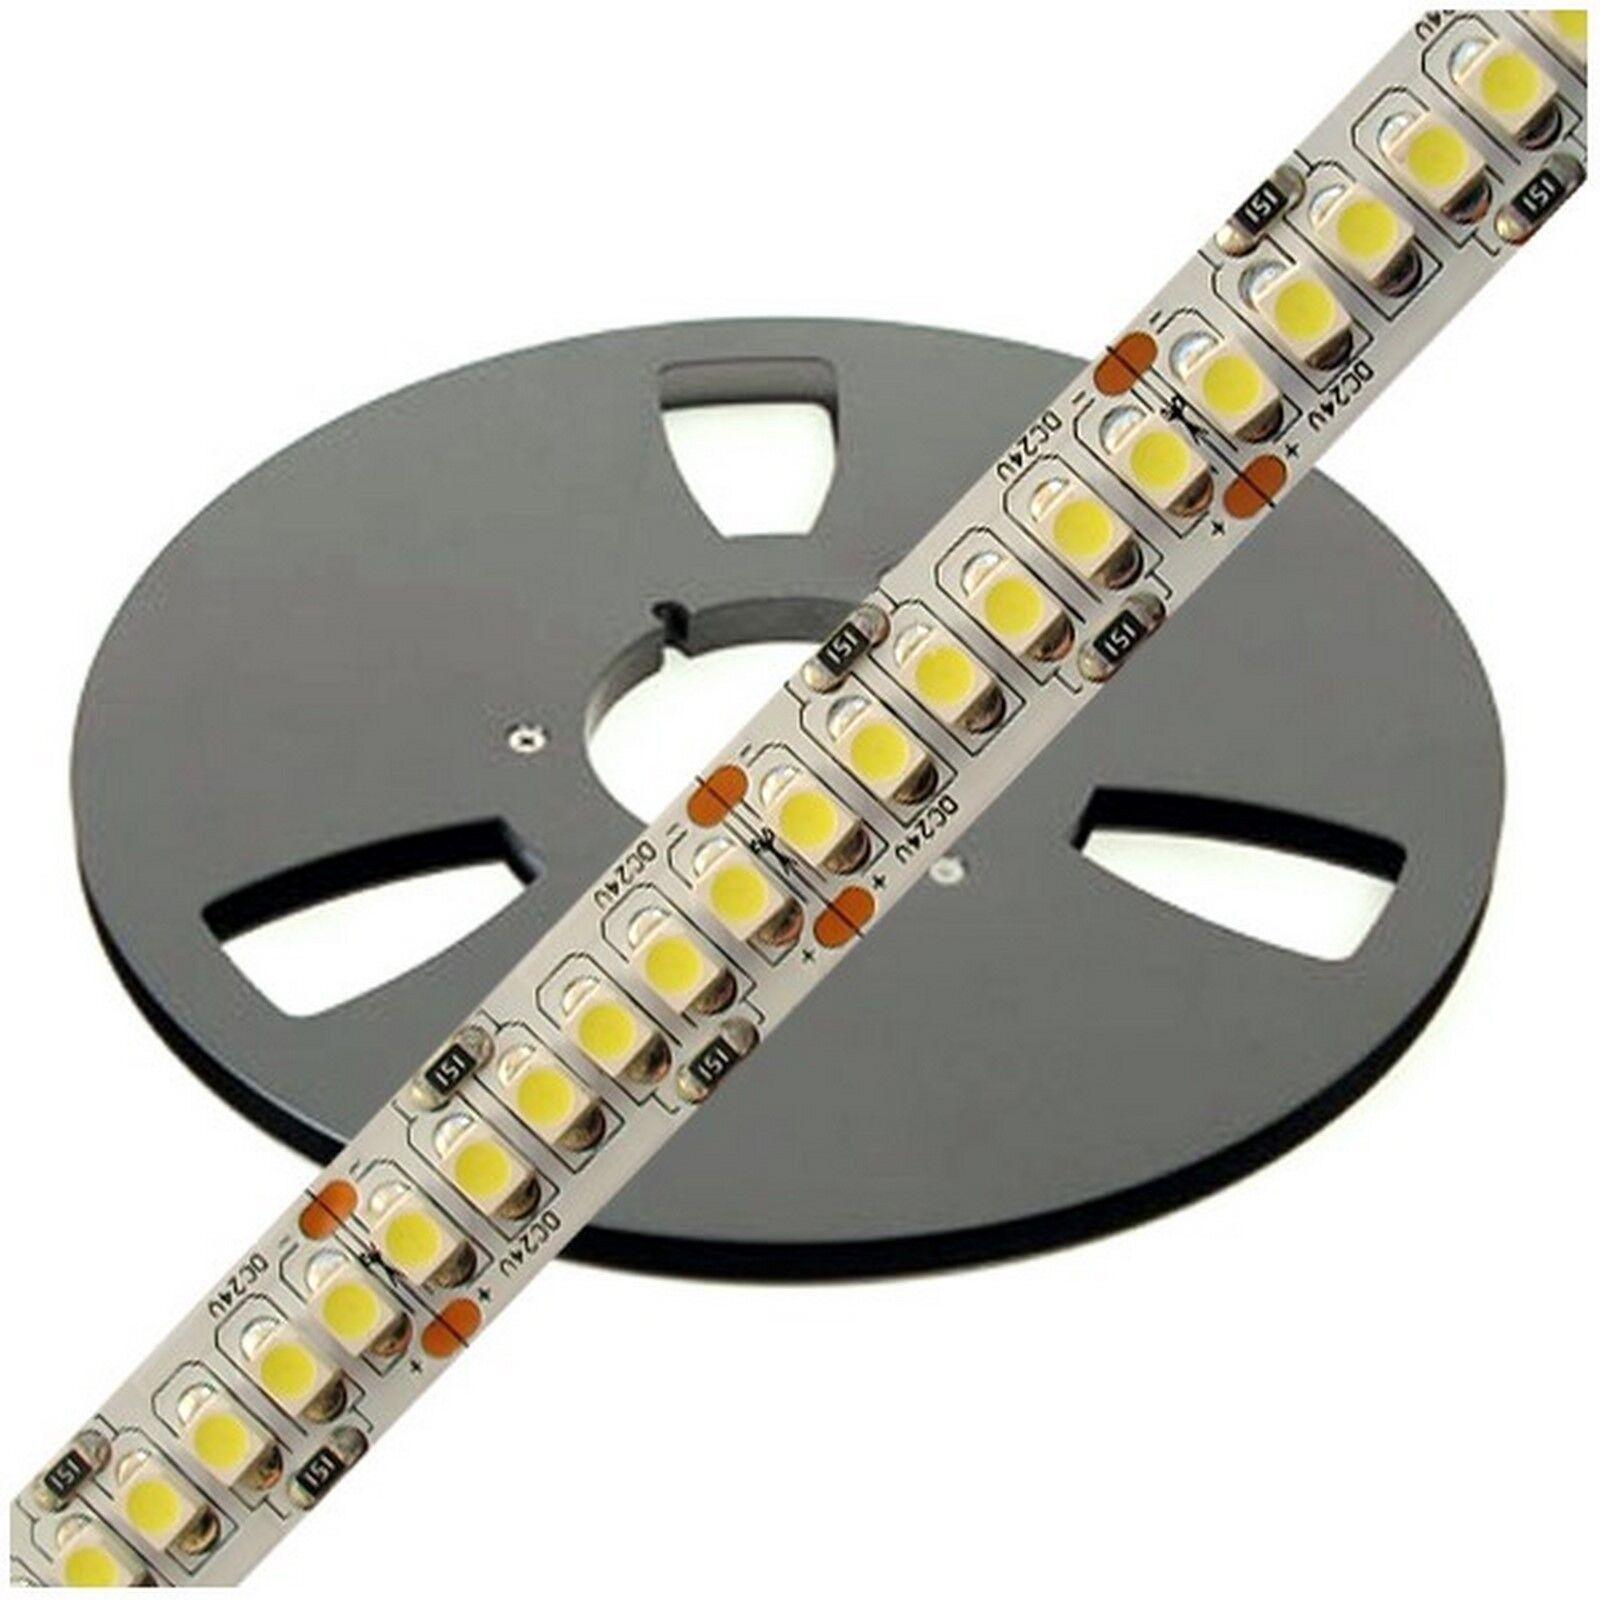 BOBINA 5MT STRIP 1200 LED 3528 BIANCO NATURALE Weiß 4000-4500K 24V 9000LM